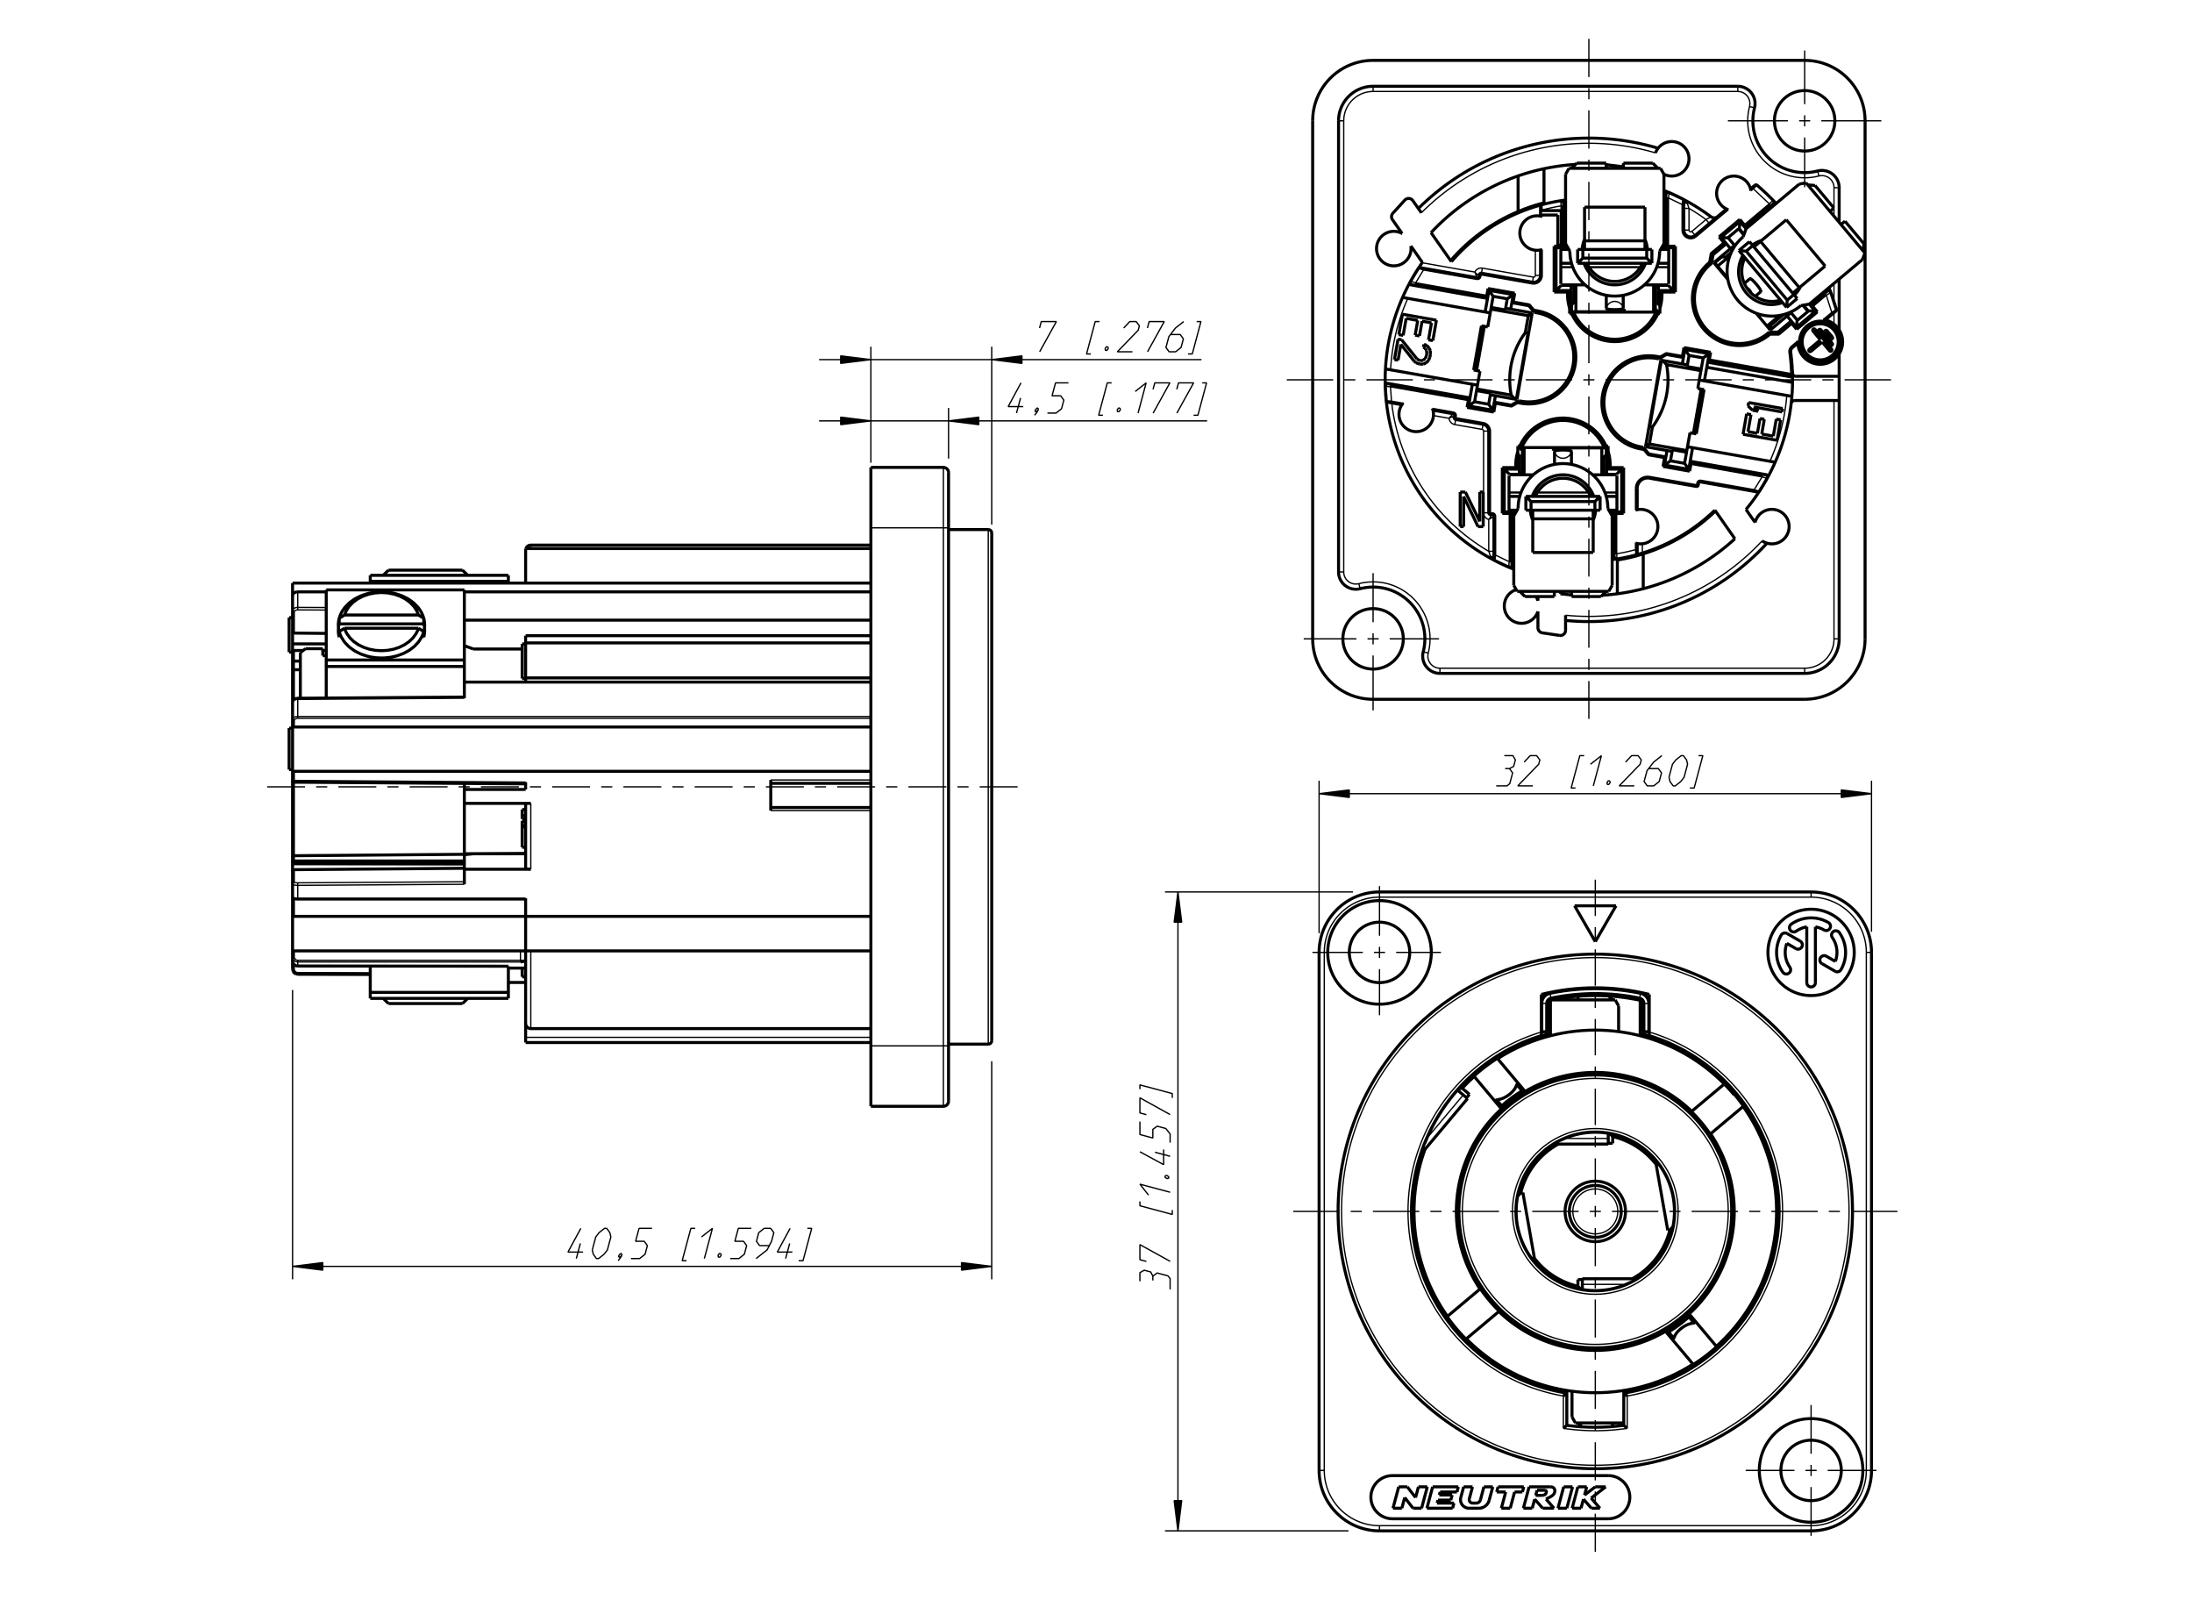 Powercon Wiring Diagram : 23 Wiring Diagram Images